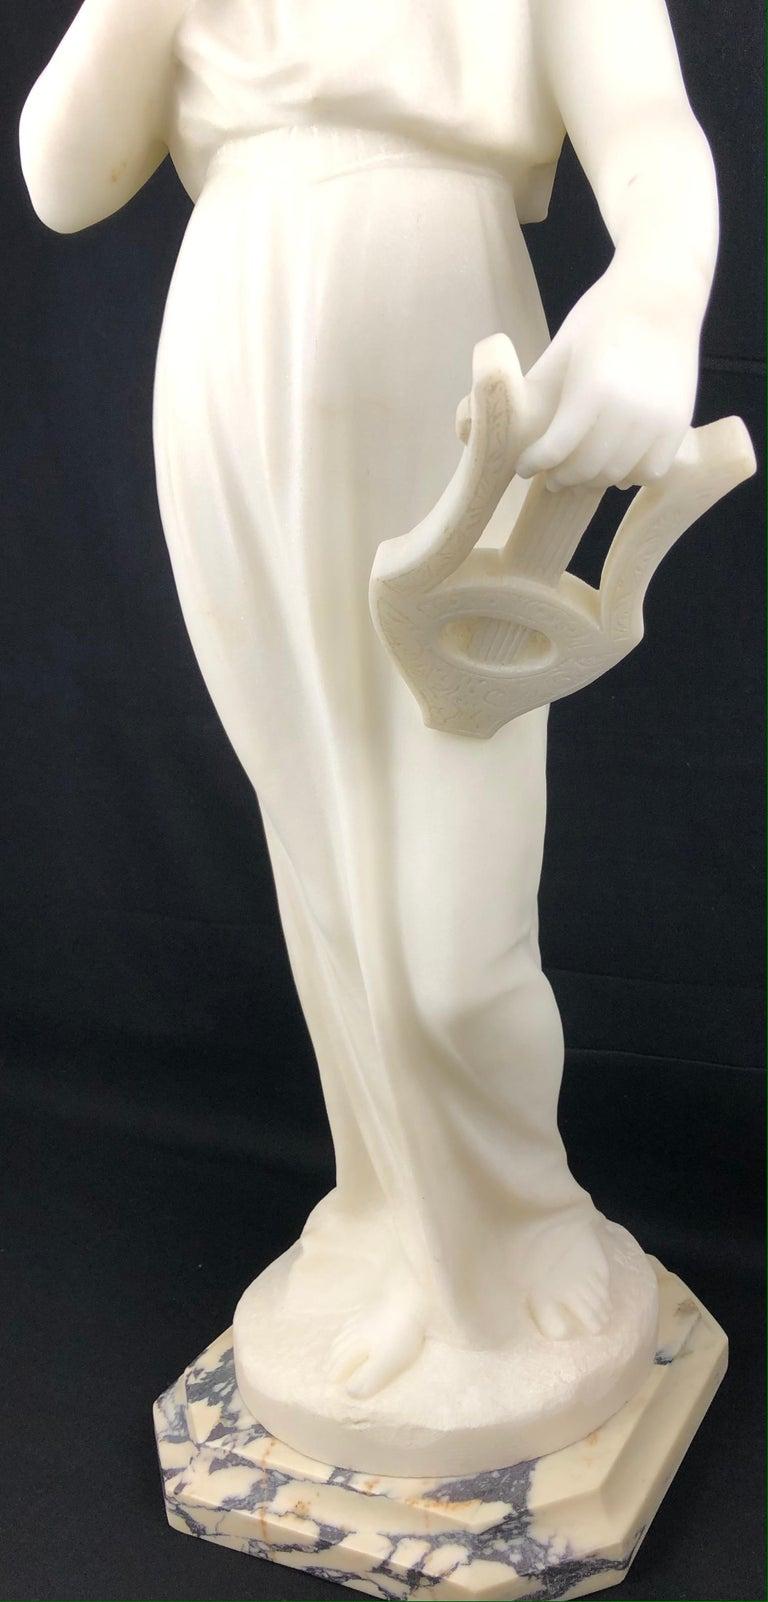 19th Century Art Nouveau White Carrara Marble Sculpture by Guglielmo Pugi Signed For Sale 7